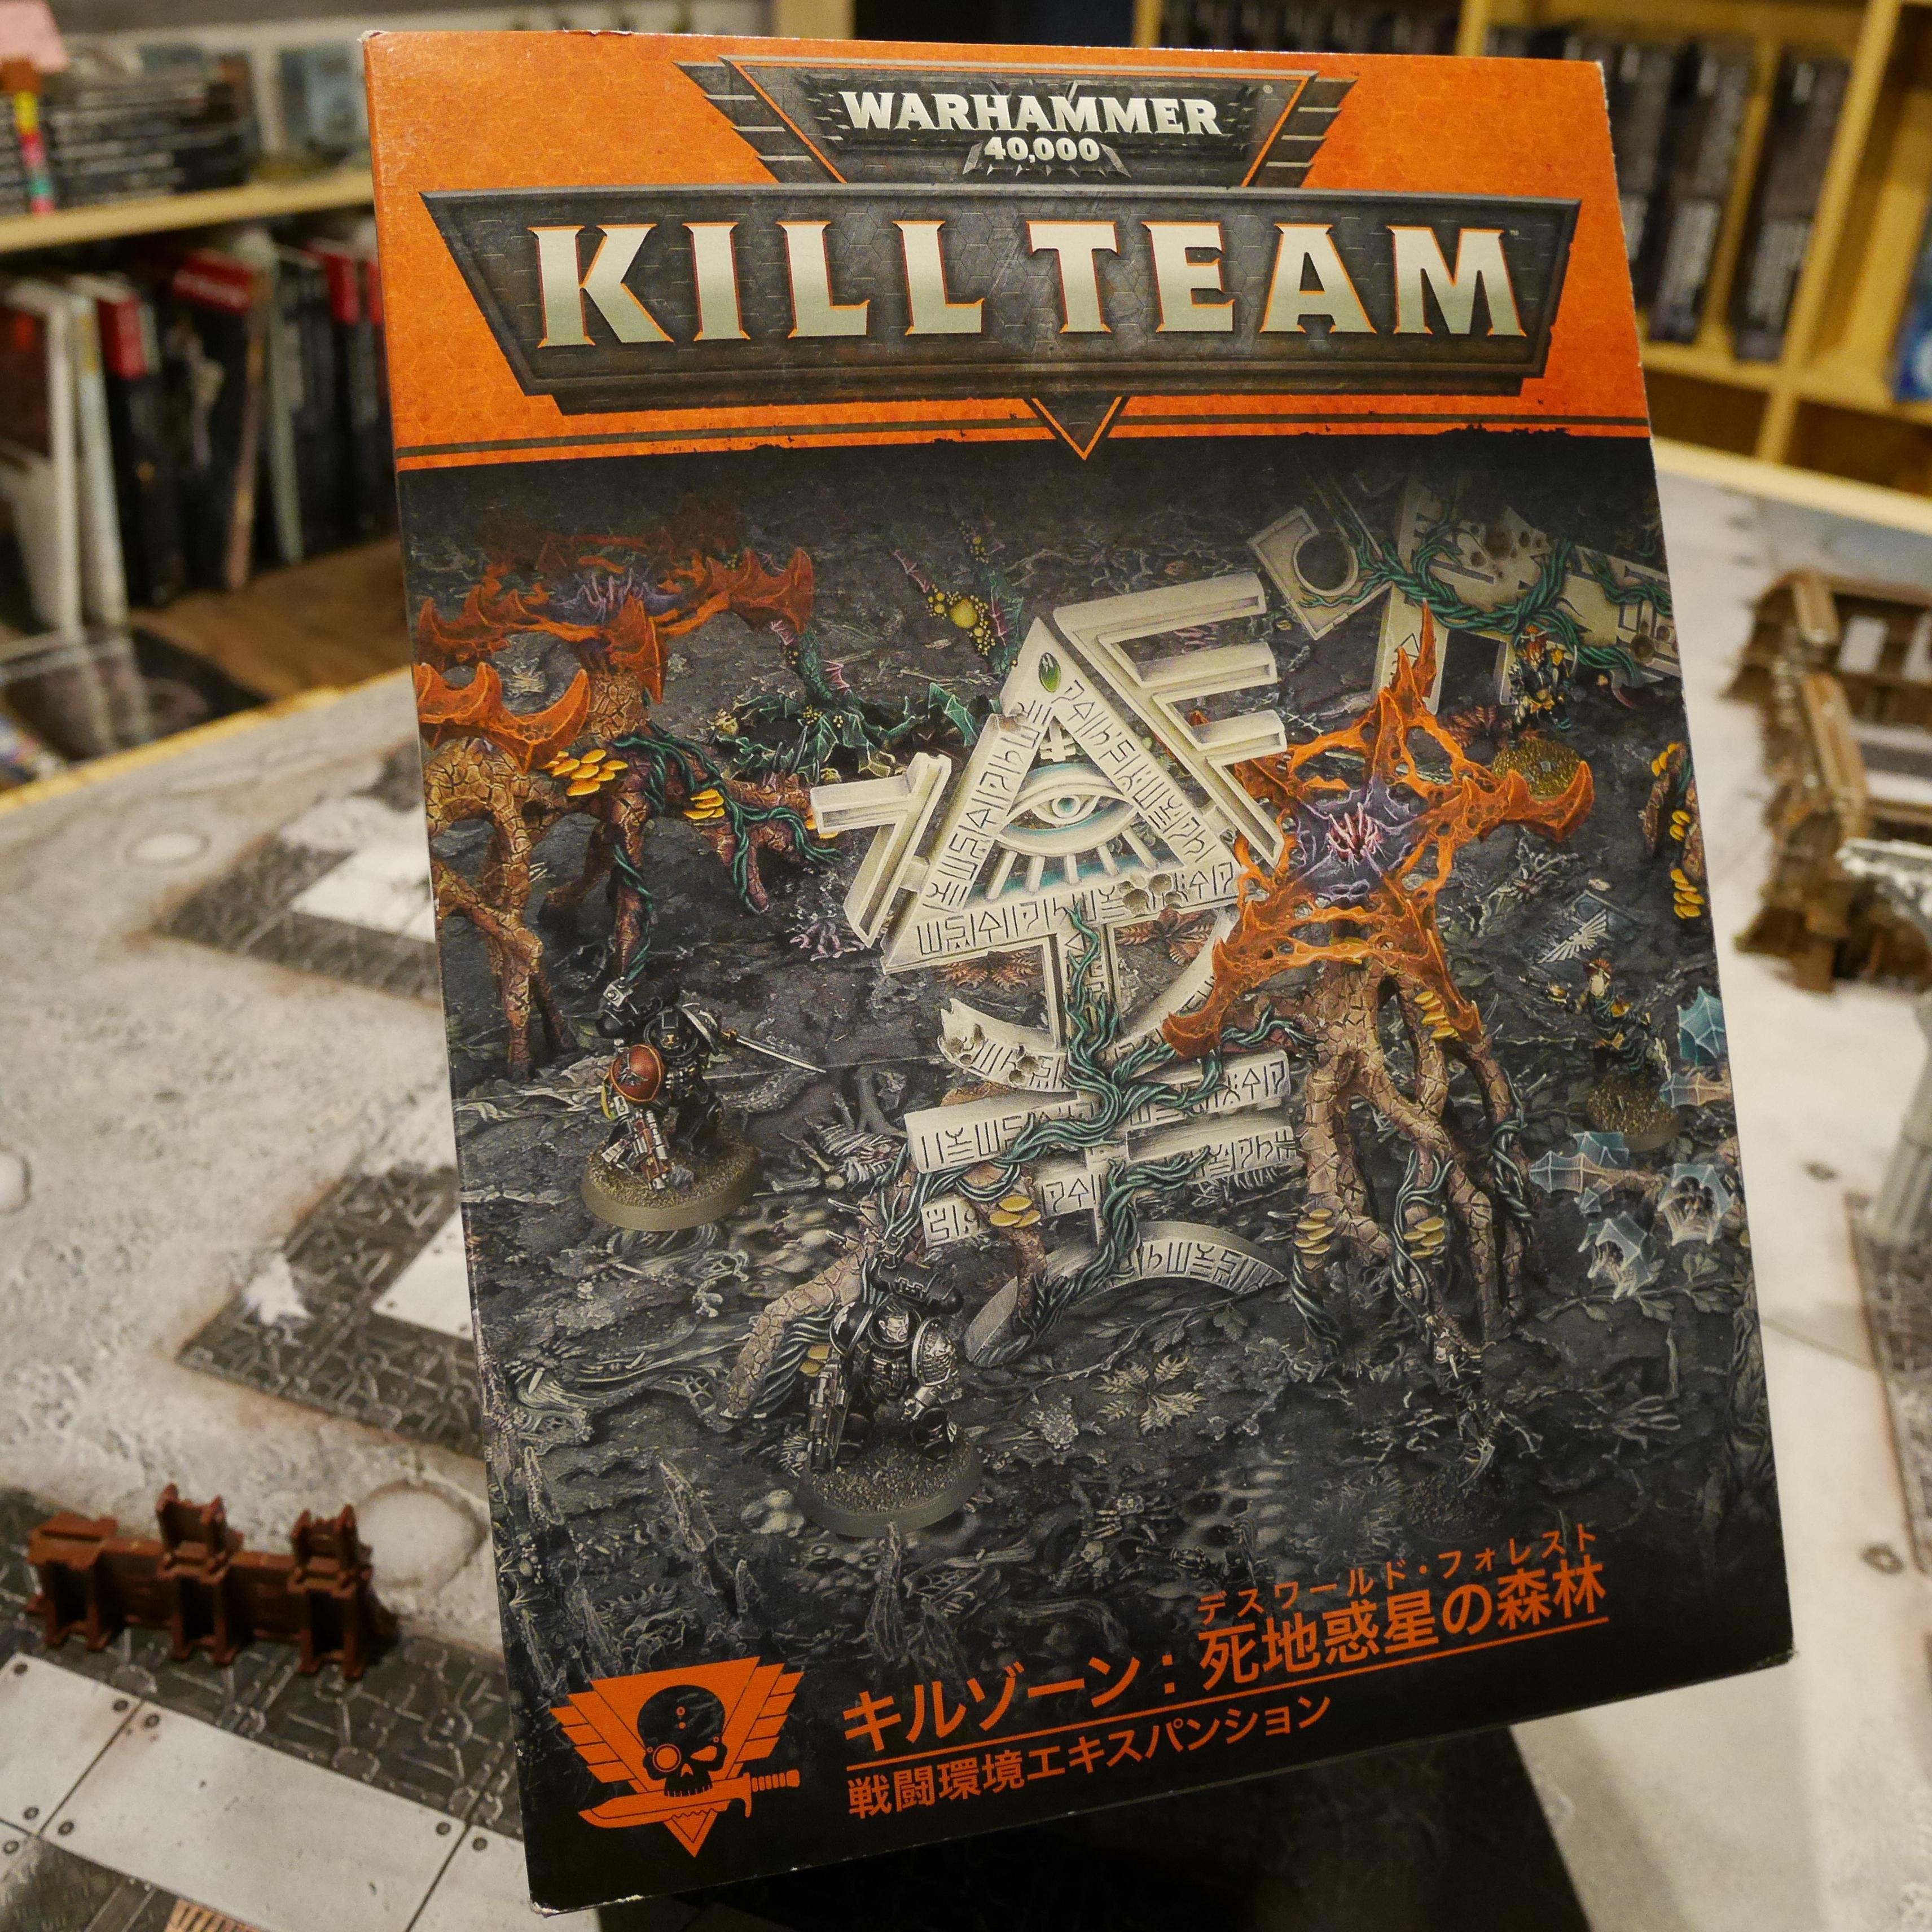 WARHAMMER 40000 KILL TEAM キルゾーン:死地惑星の森林 デスワールド・フォレスト 戦闘環境エキスパンション